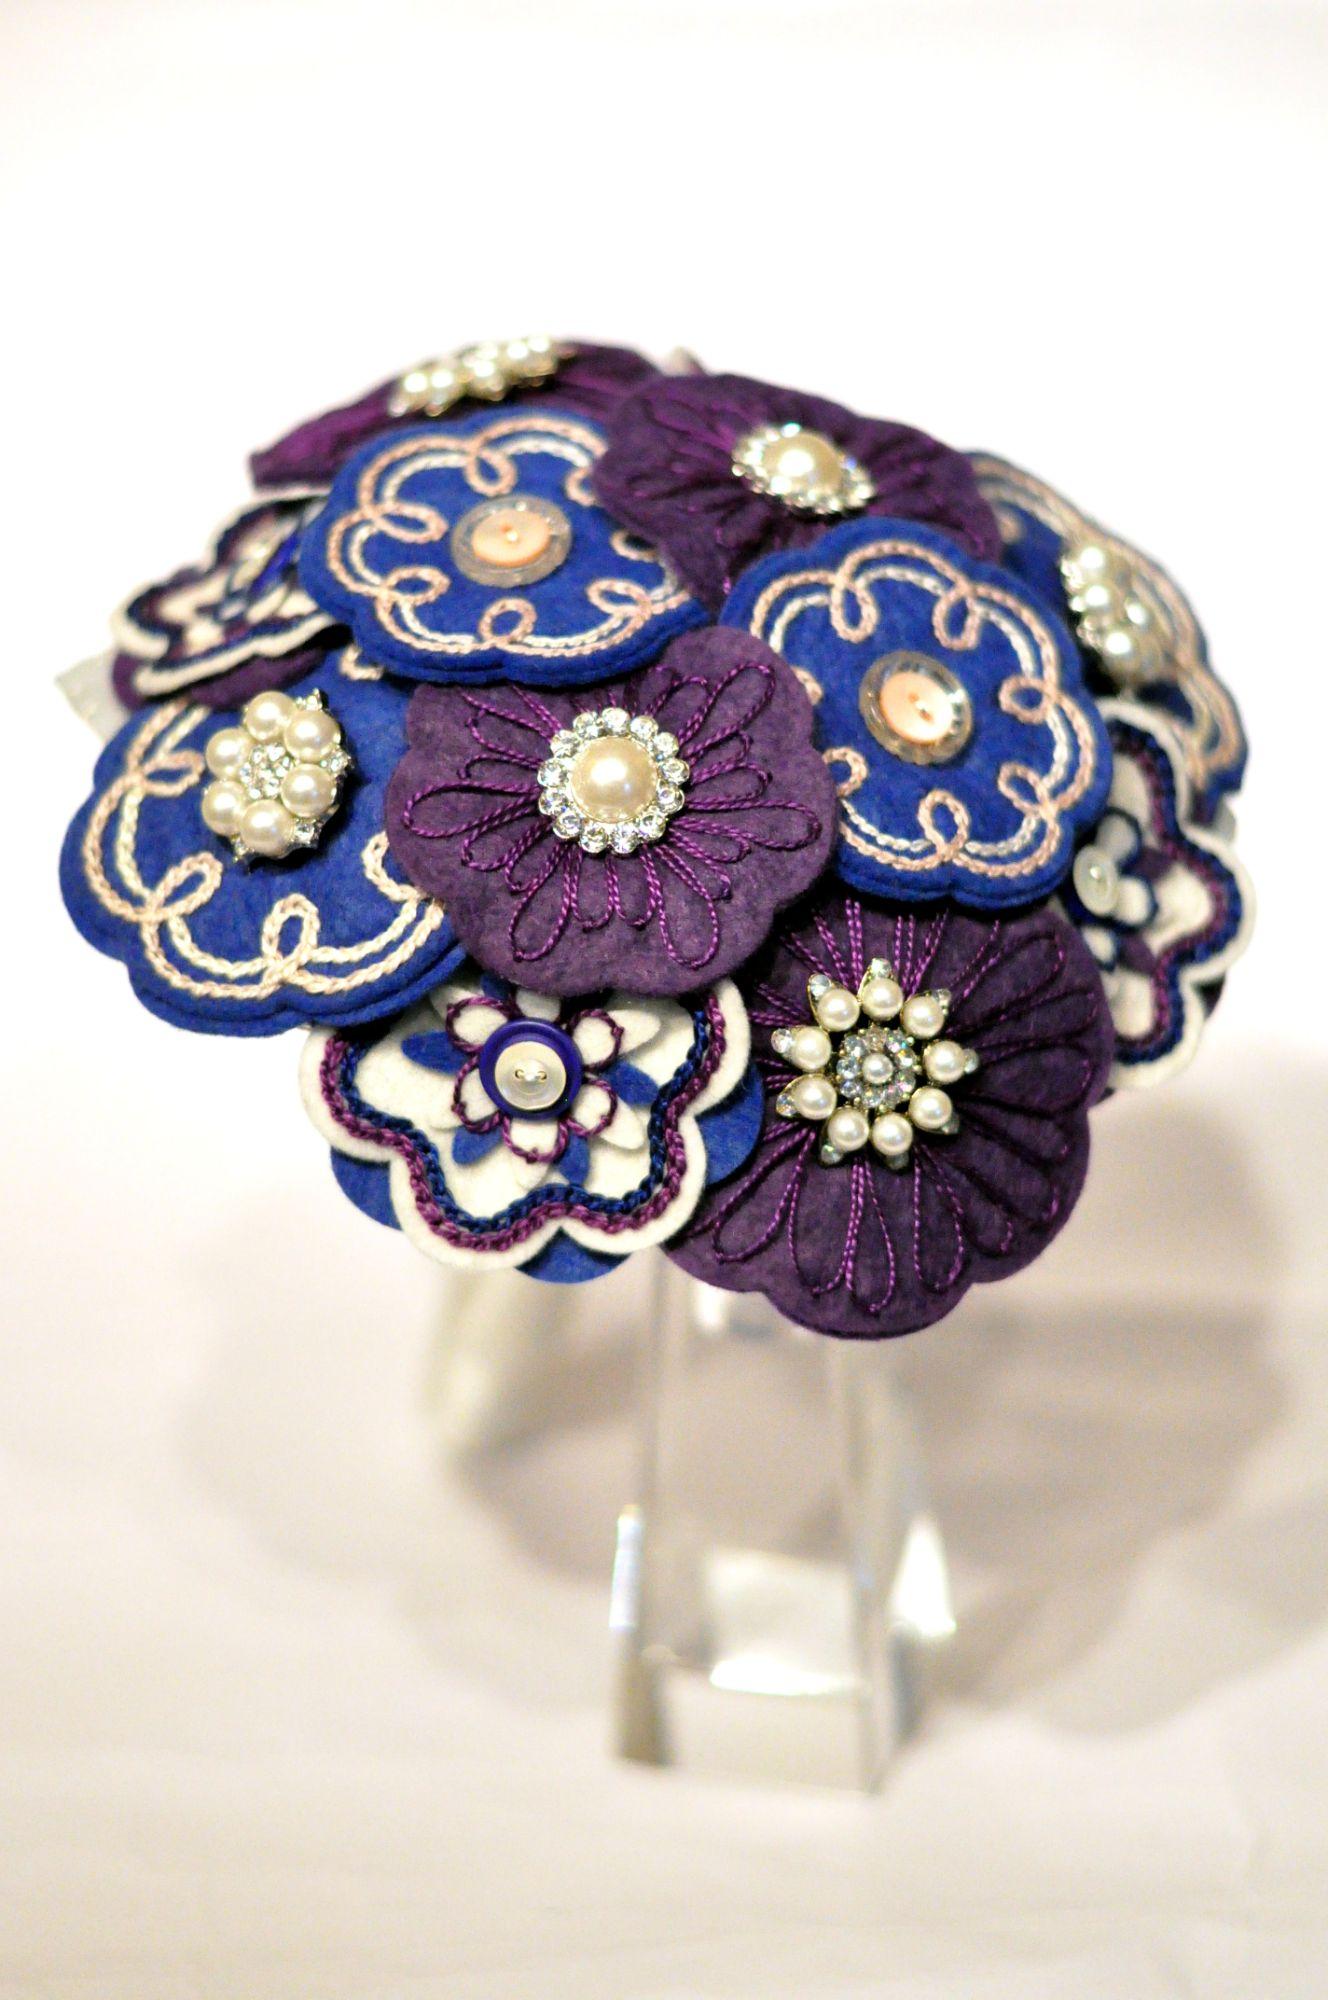 Blue and purple felt flower bouquet.JPG